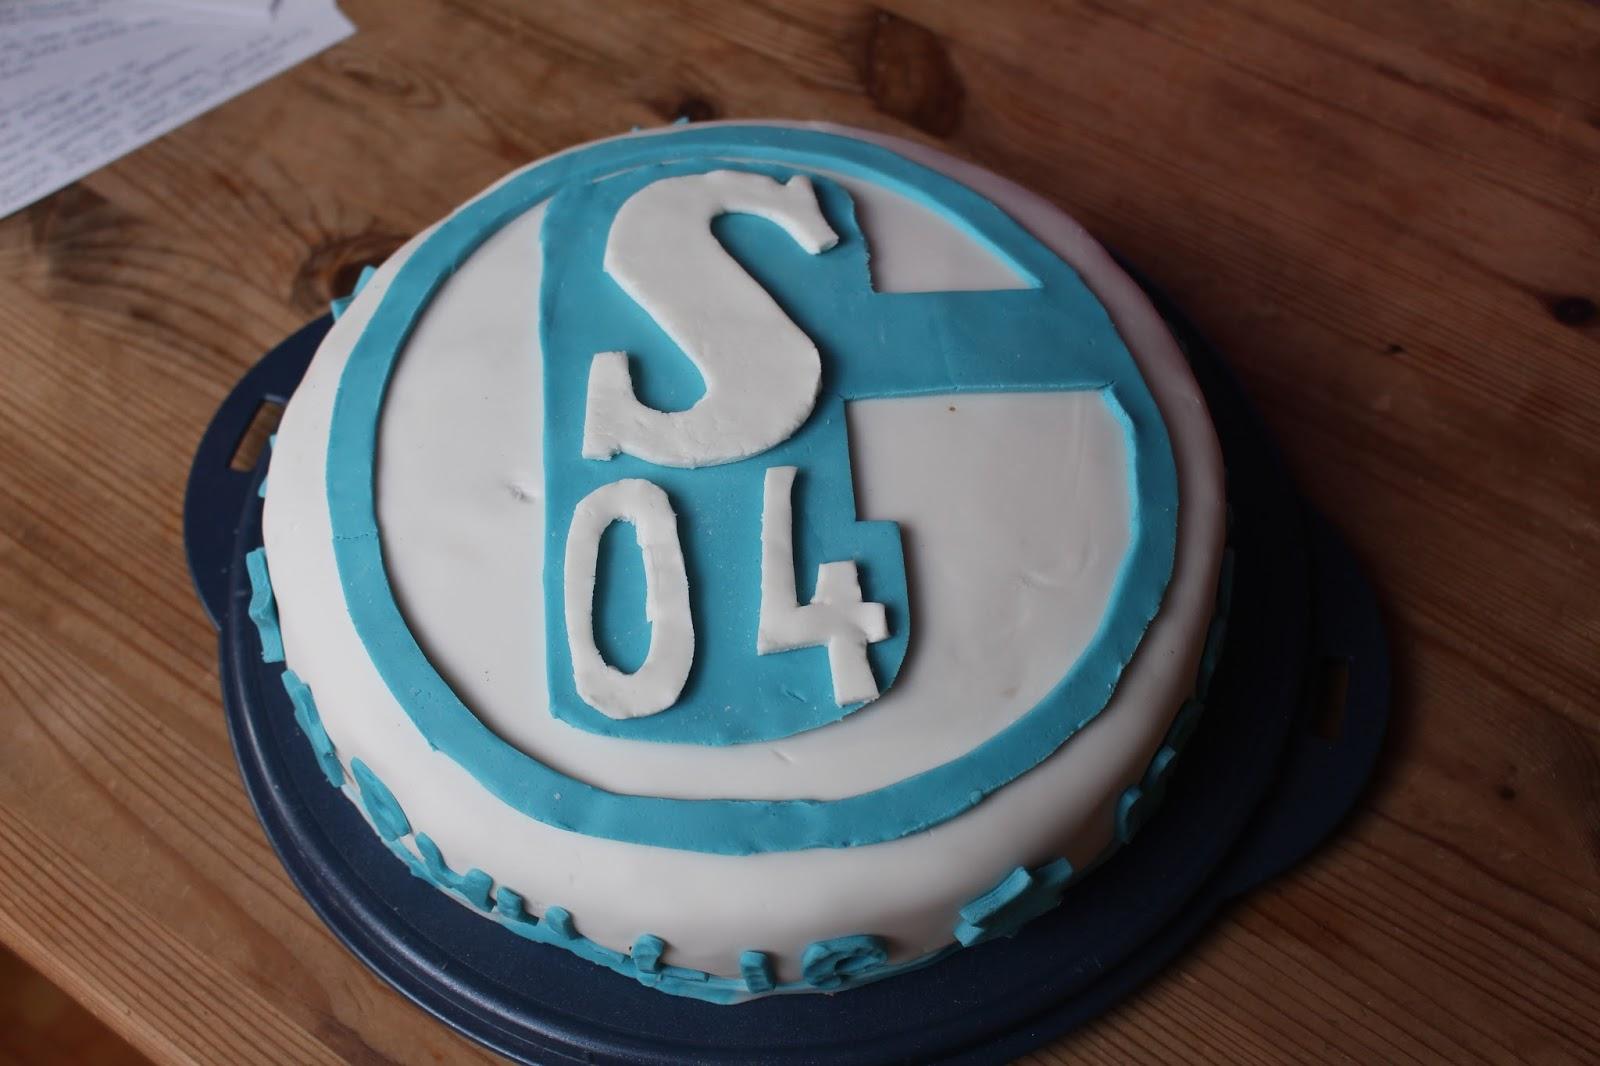 Schalke 04 / Fondanttorte   Küchenhexe